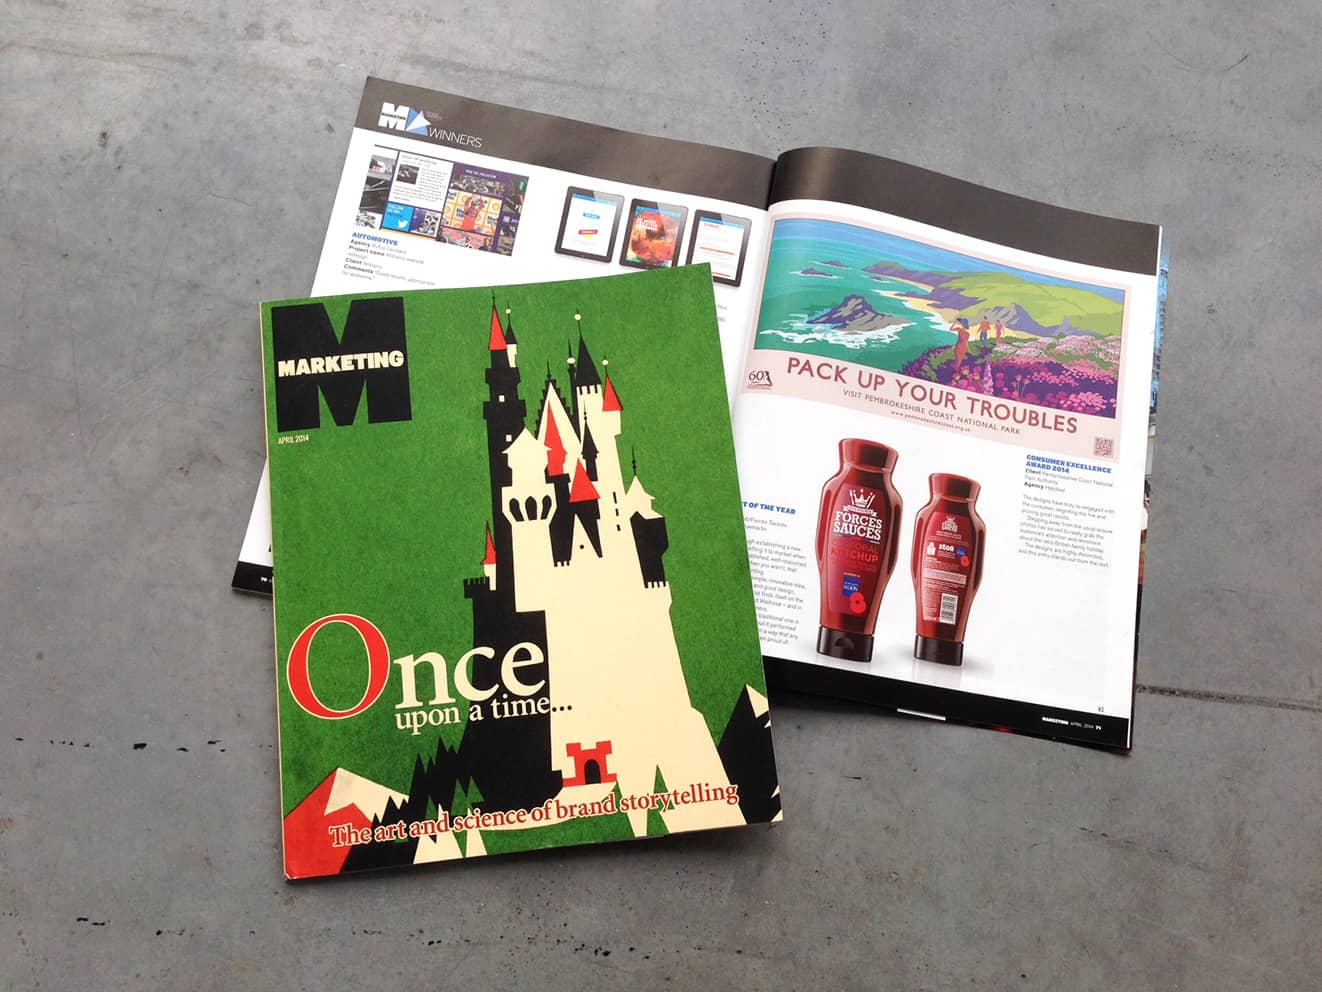 Hatched in Marketing Magazine